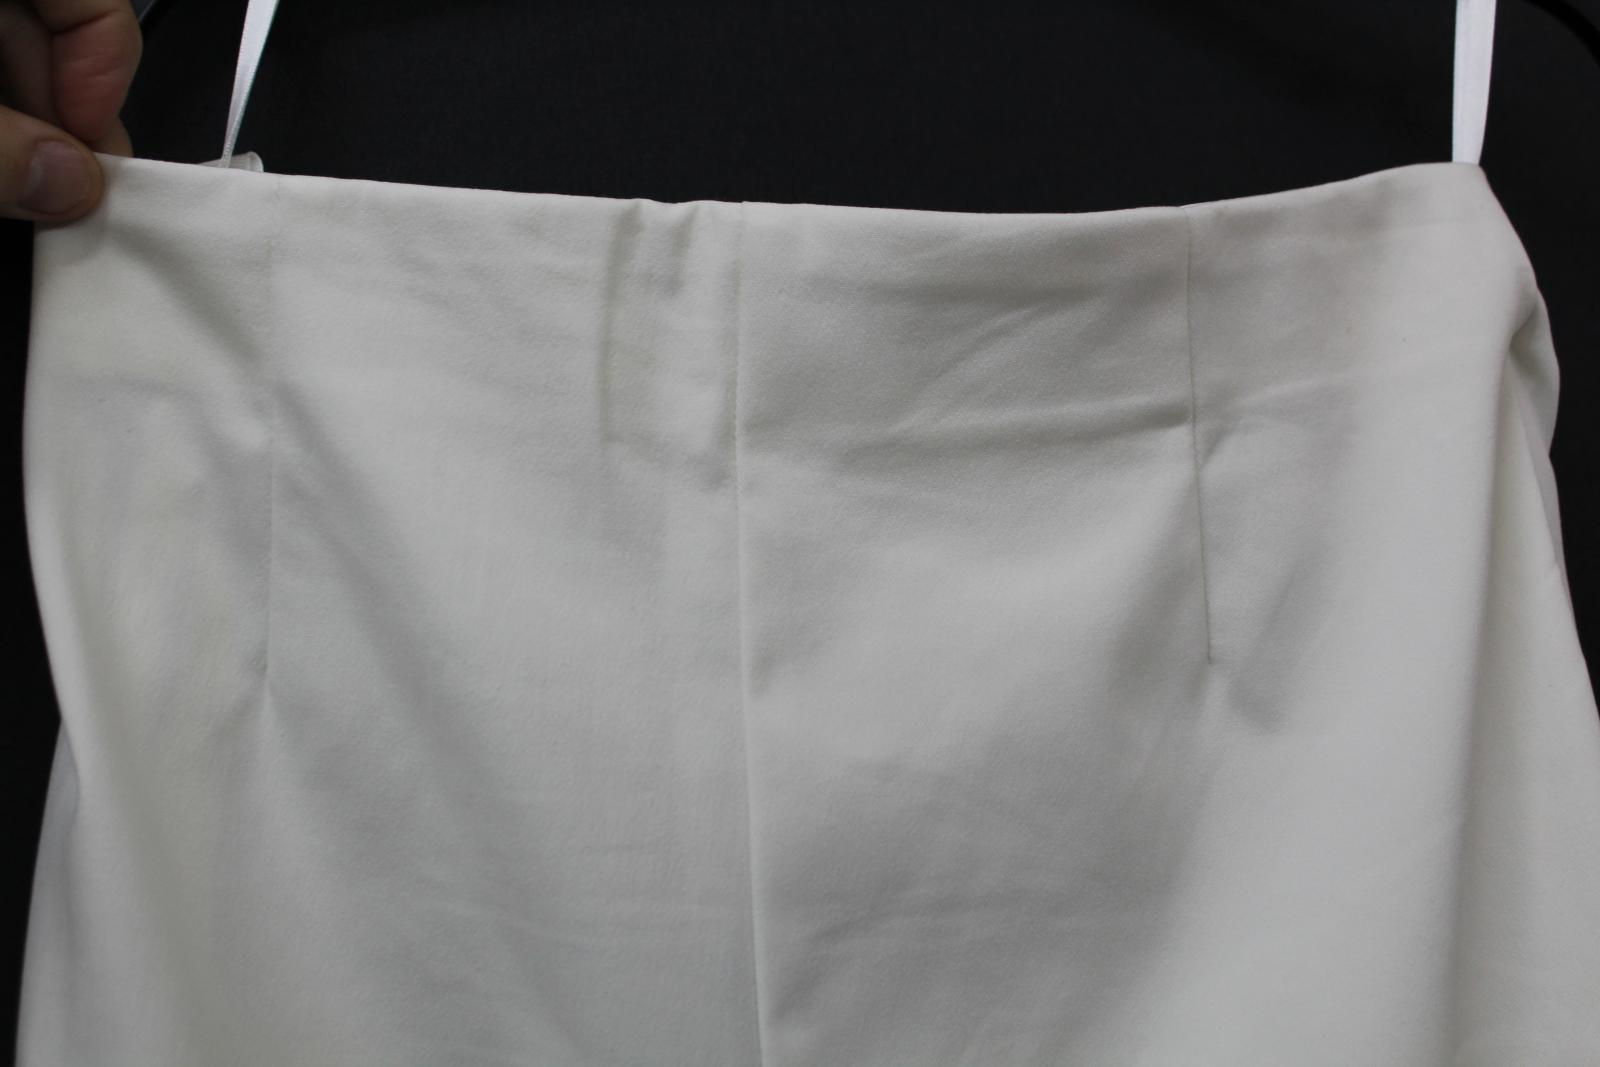 Costa-Damas-Marfil-Alexa-Algodon-Mezcla-recortada-High-rise-Pantalones-Cremallera-Lateral-UK14 miniatura 6